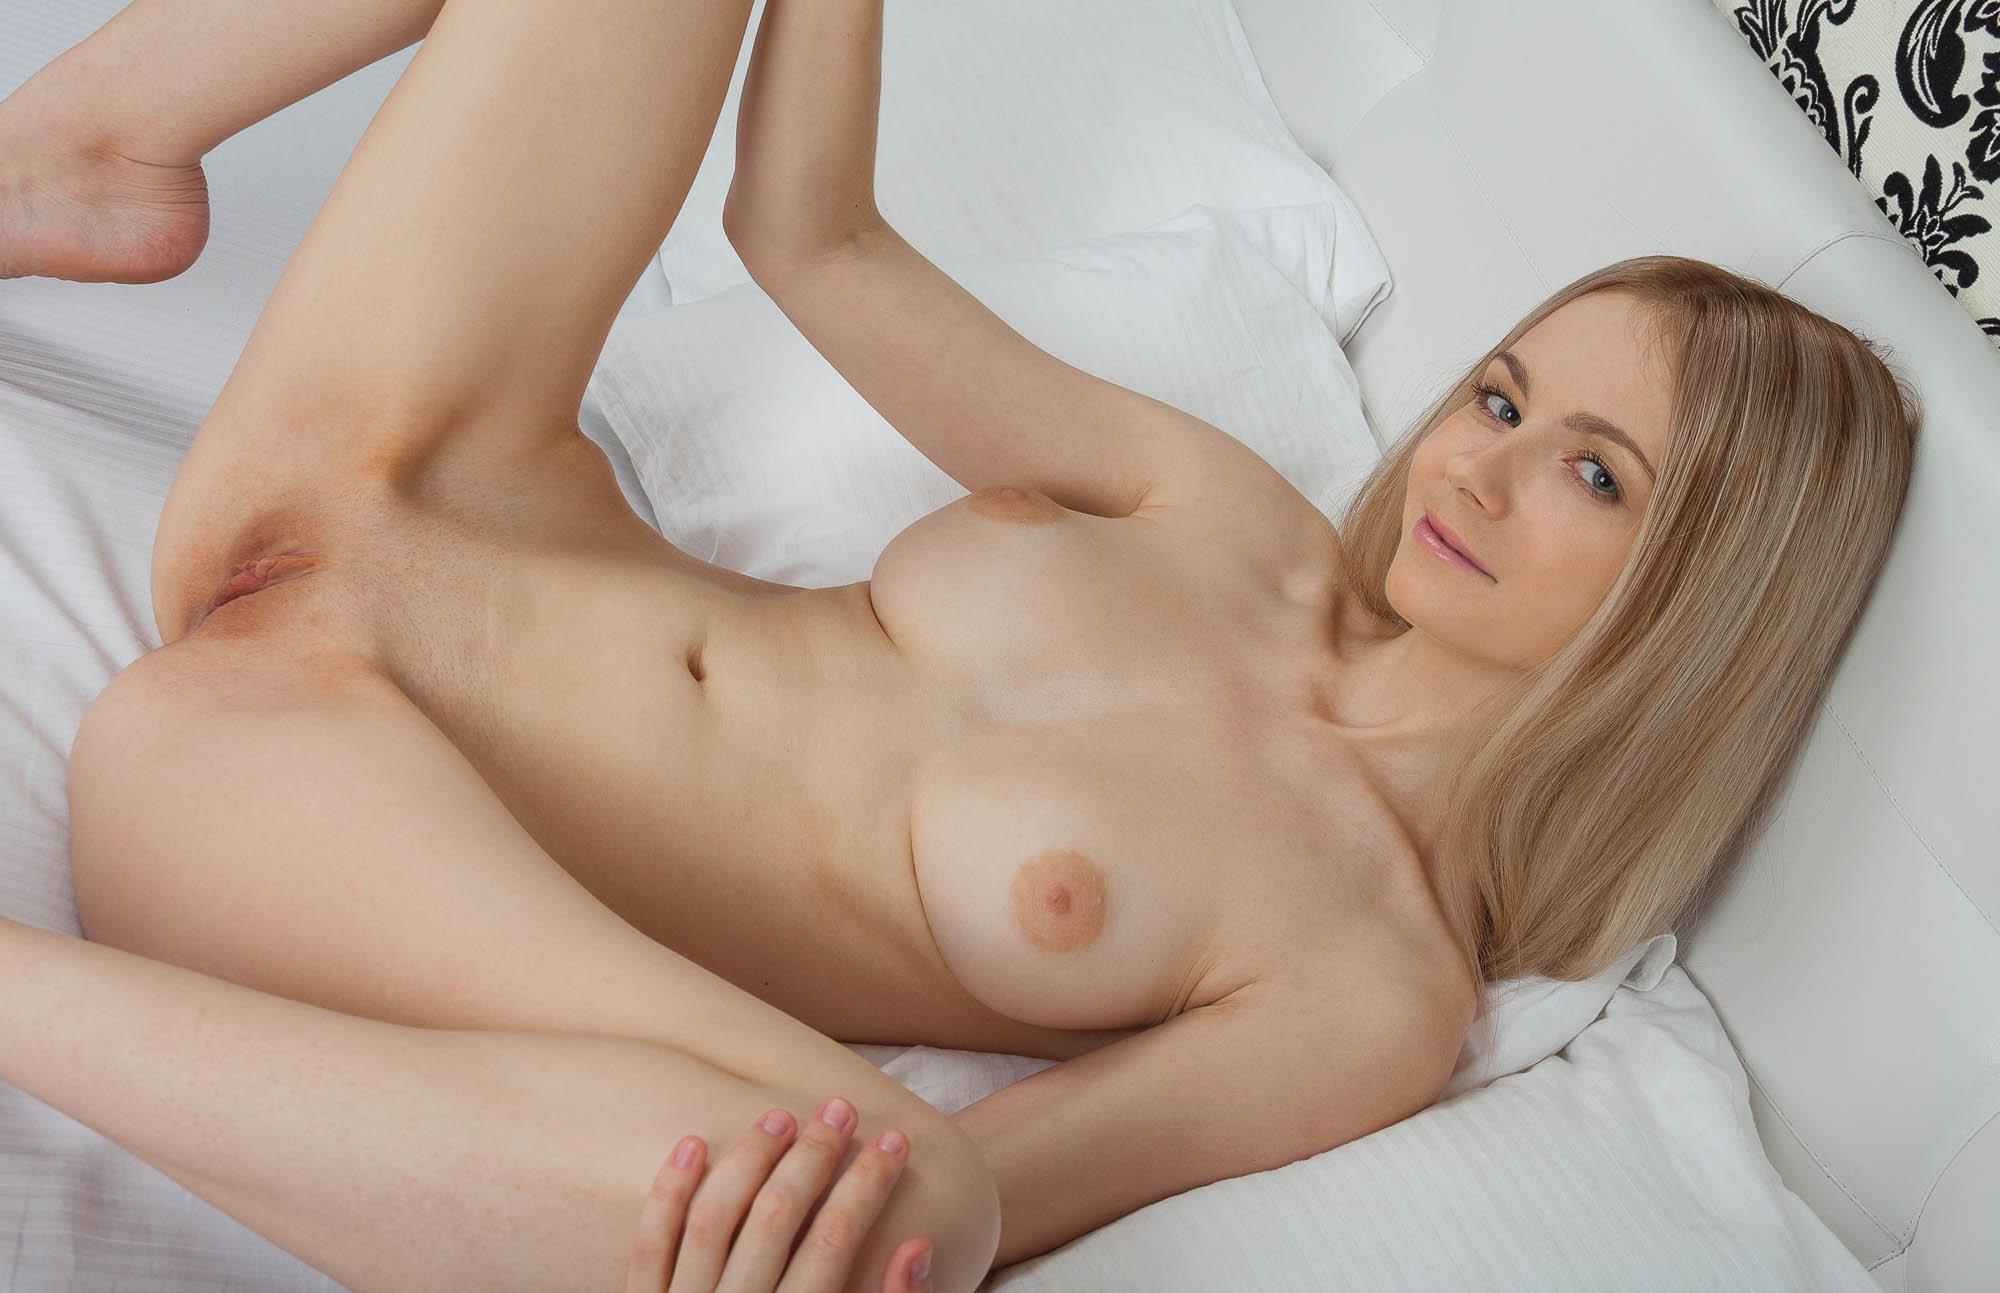 Metart nude sex, girl in yoga pants having hardcore anal sex